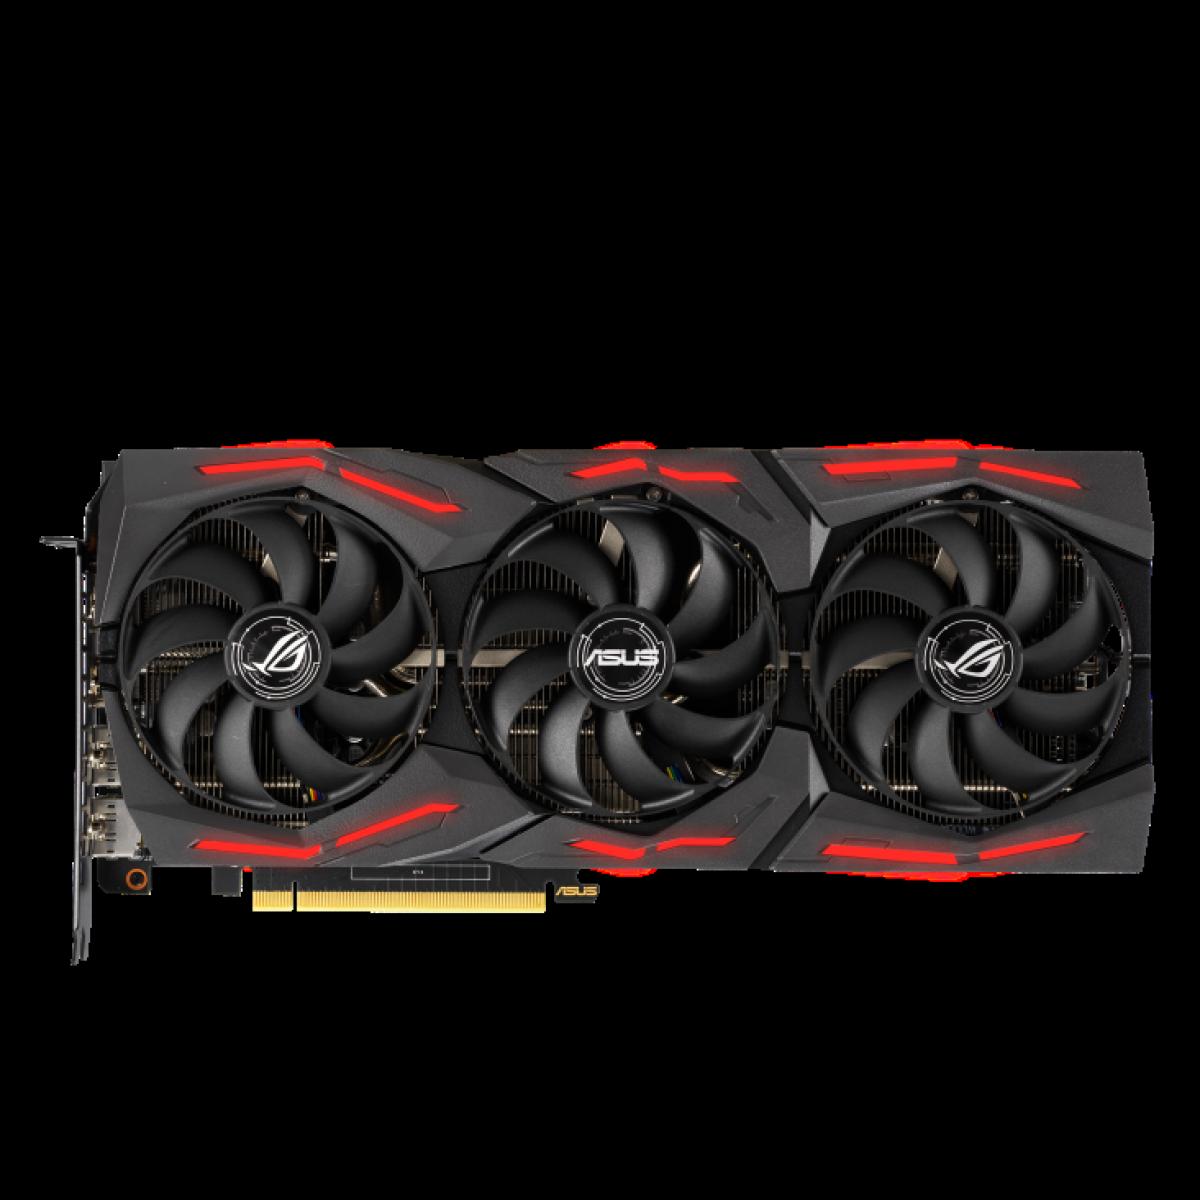 Placa de Vídeo Asus GeForce RTX 2060 Rog Strix EVO Gaming, 6GB GDDR6, 196Bit, ROG-STRIX-RTX2060-A6G-EVO-GAMING